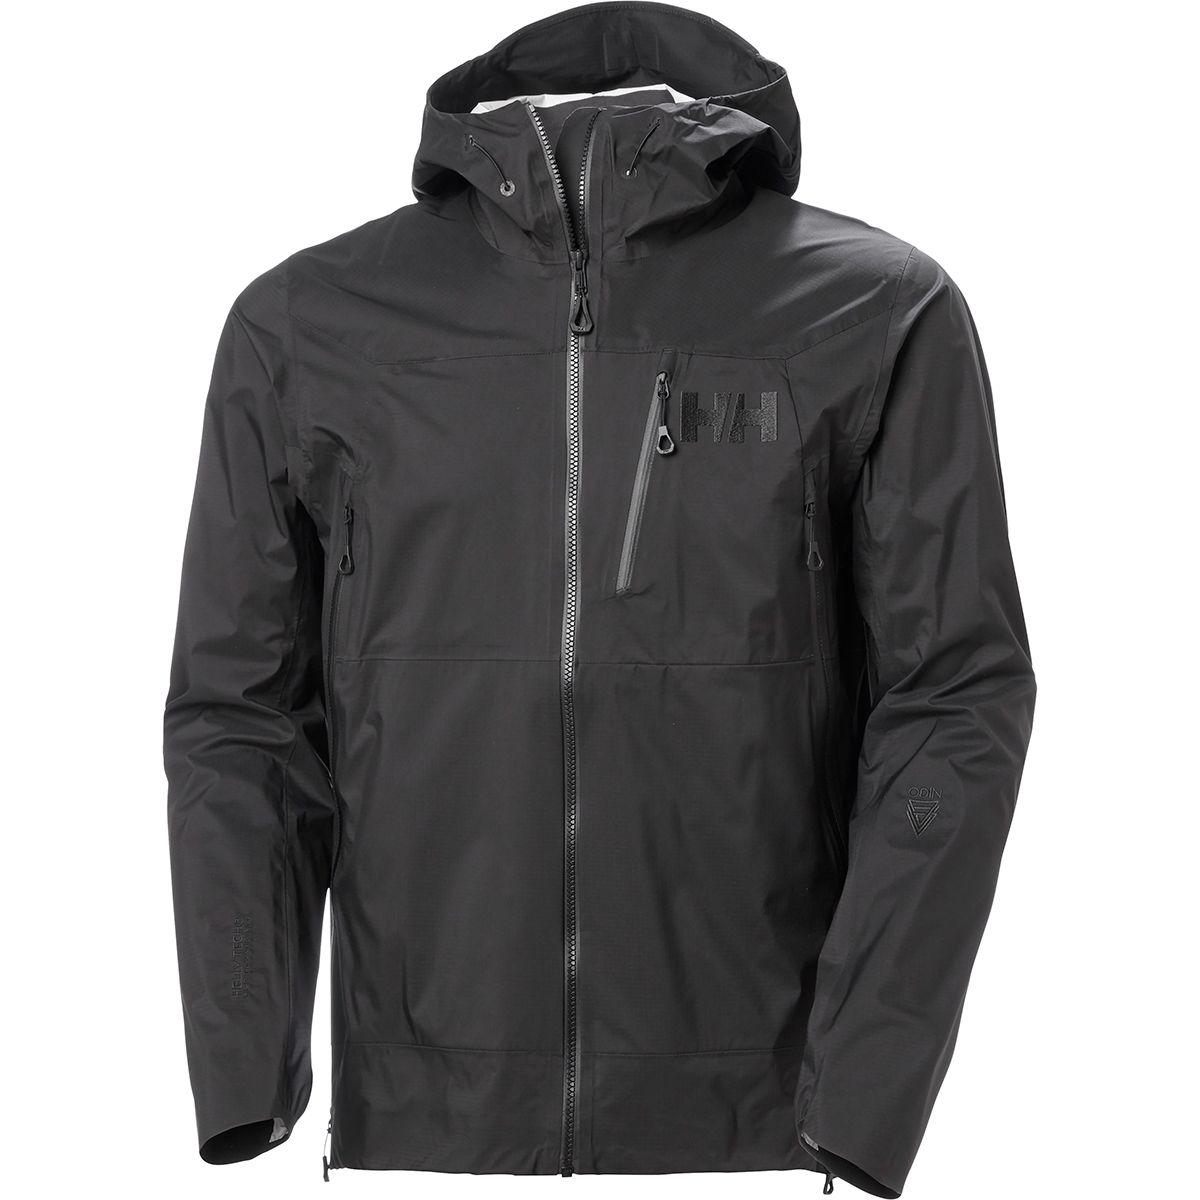 Helly Hansen Odin 3D Air Shell Jacket